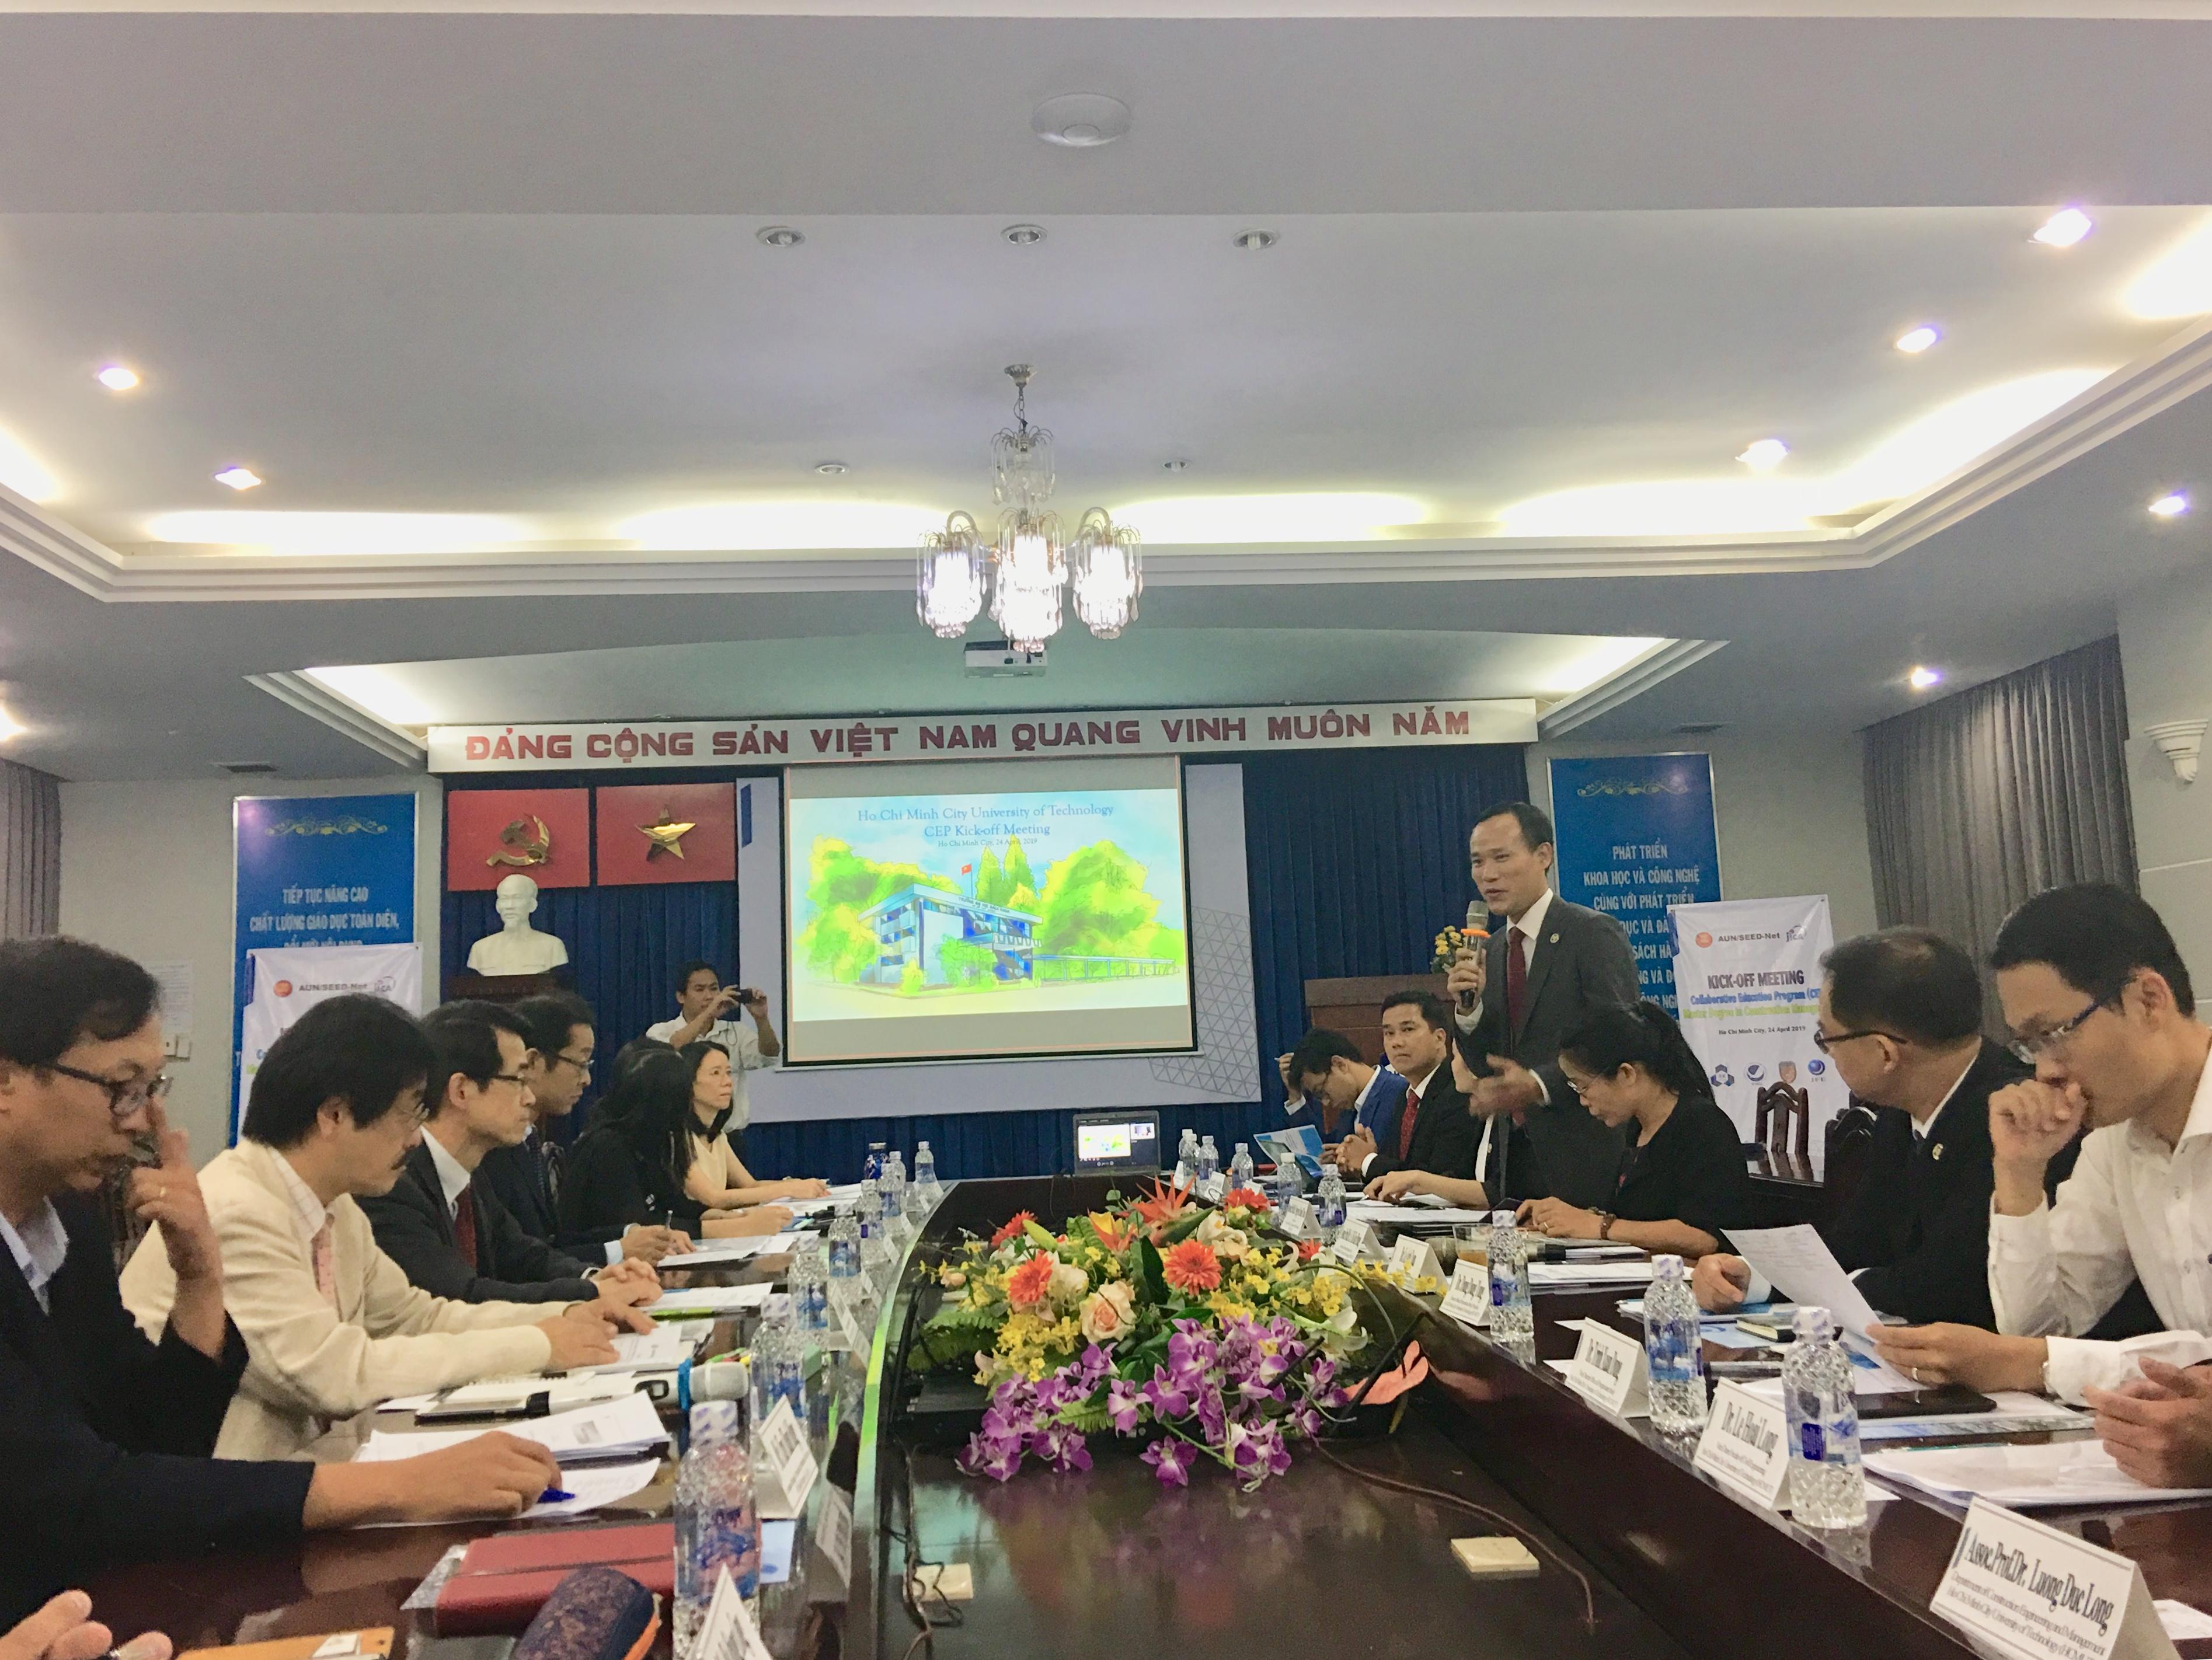 HCMUT Vice Rector Nguyen Danh Thao opening CEP Kick off meeting HCMUT Bach khoa YNU YTU JFE